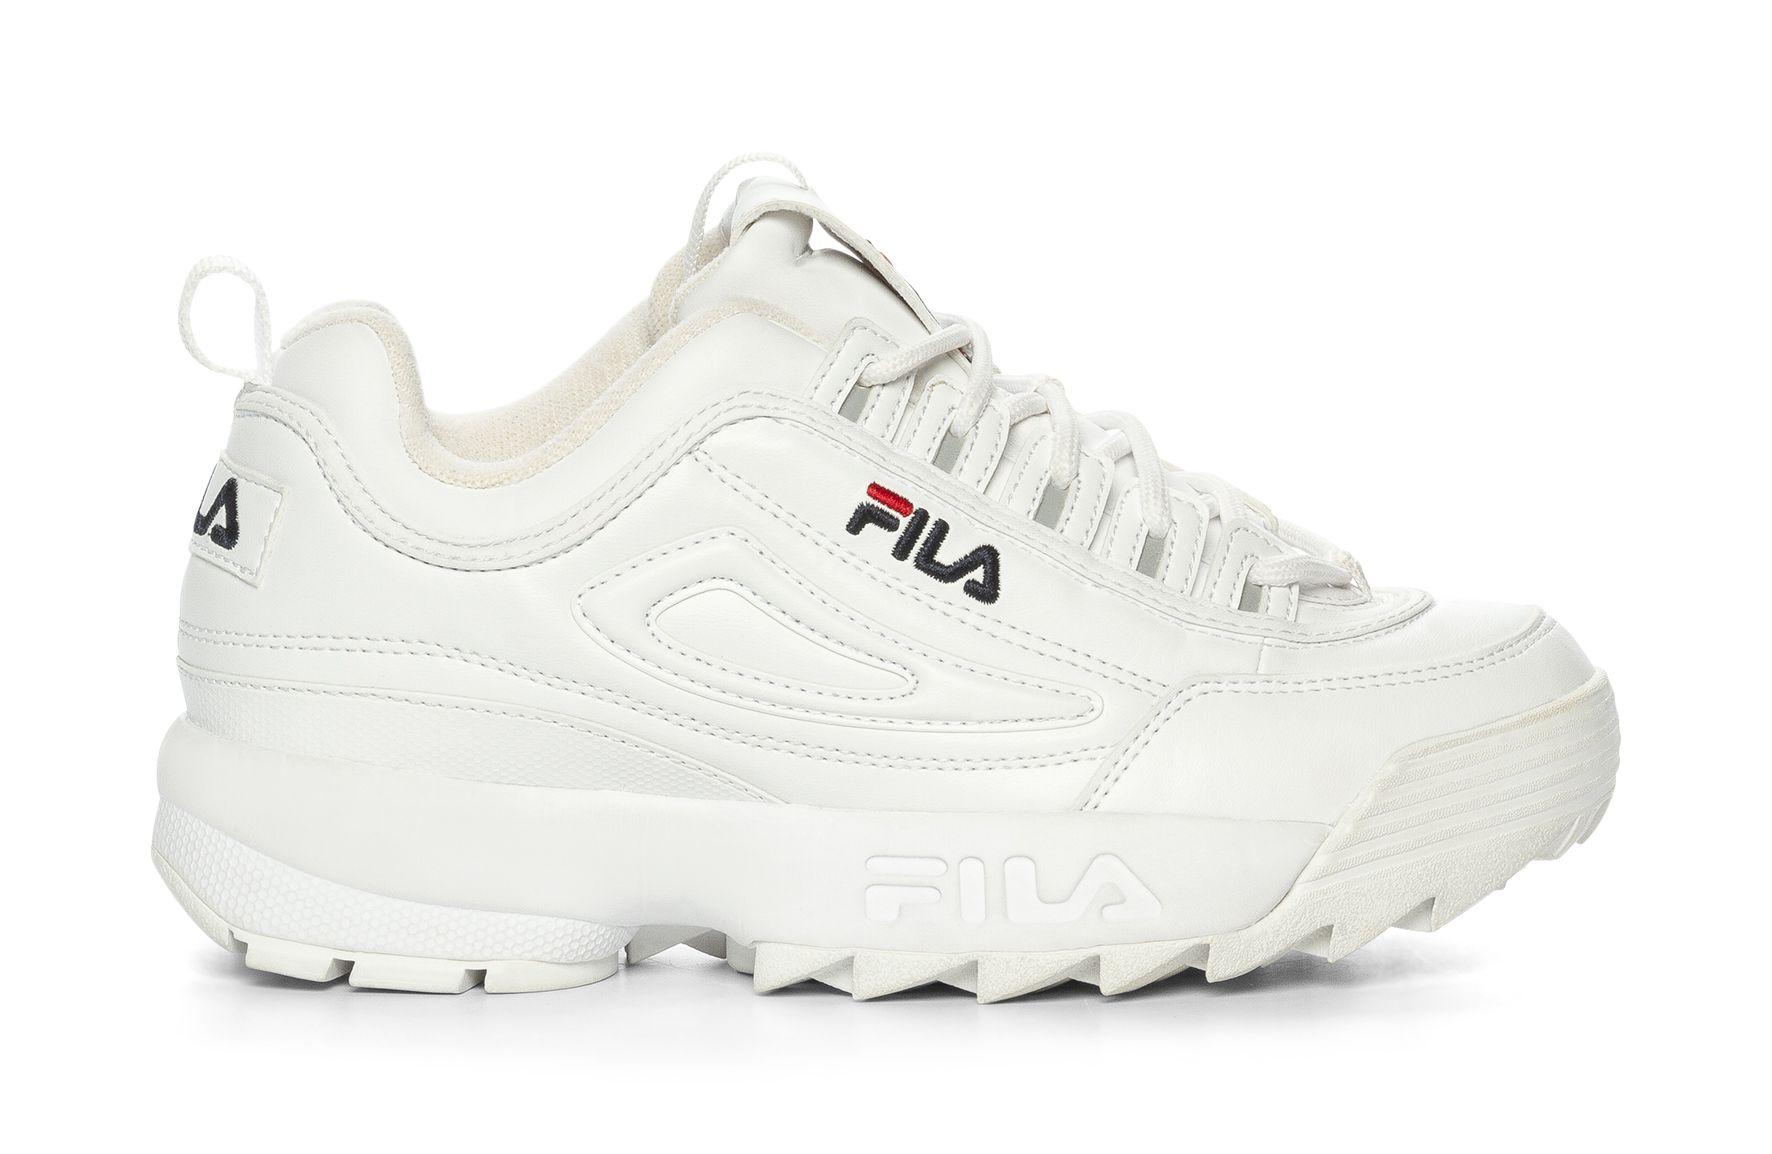 Fila Disruptor Low Wmn Valkoinen 315093 Feetfirst Fi Cute Sneakers Fila Disruptors Fila